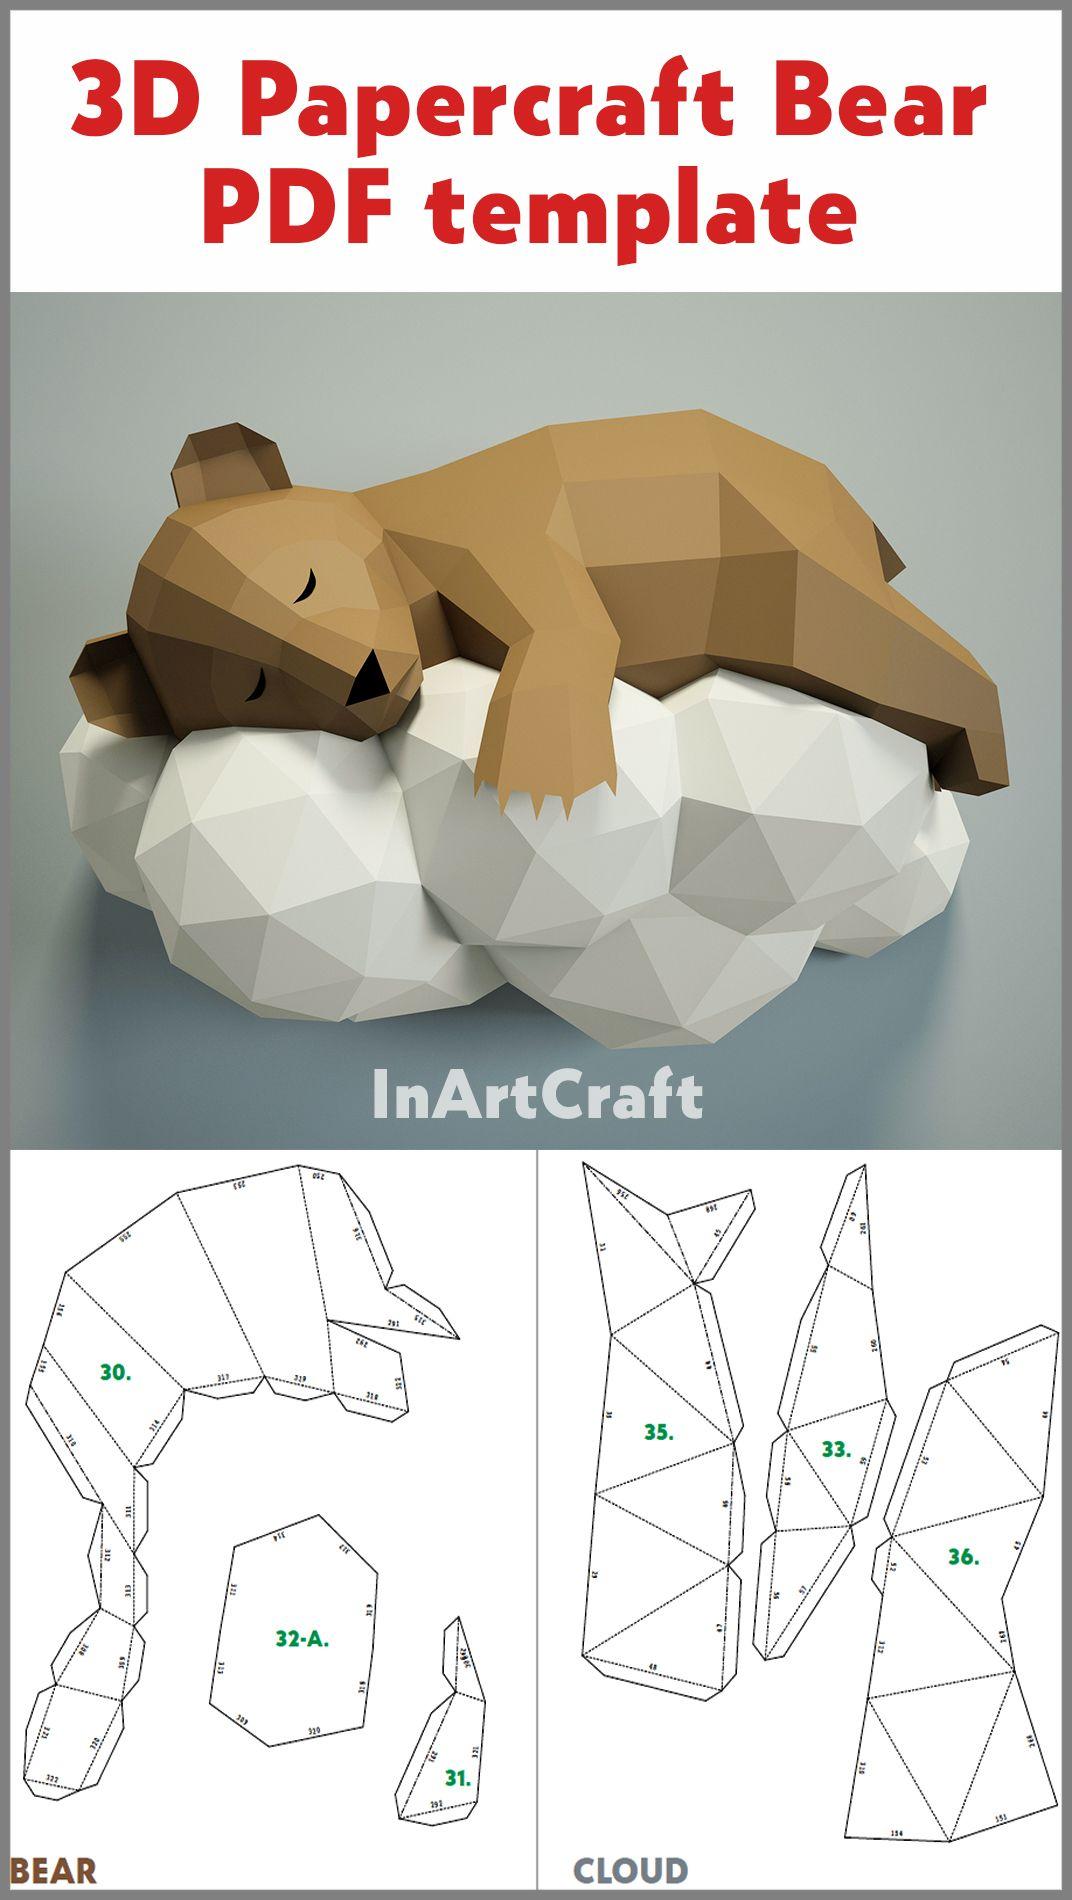 étourdissant  Mot-Clé PDF Papercraft Bear on a cloud, Paper Craft 3D origami kit, 3D Papercraft animal, DIY paper model